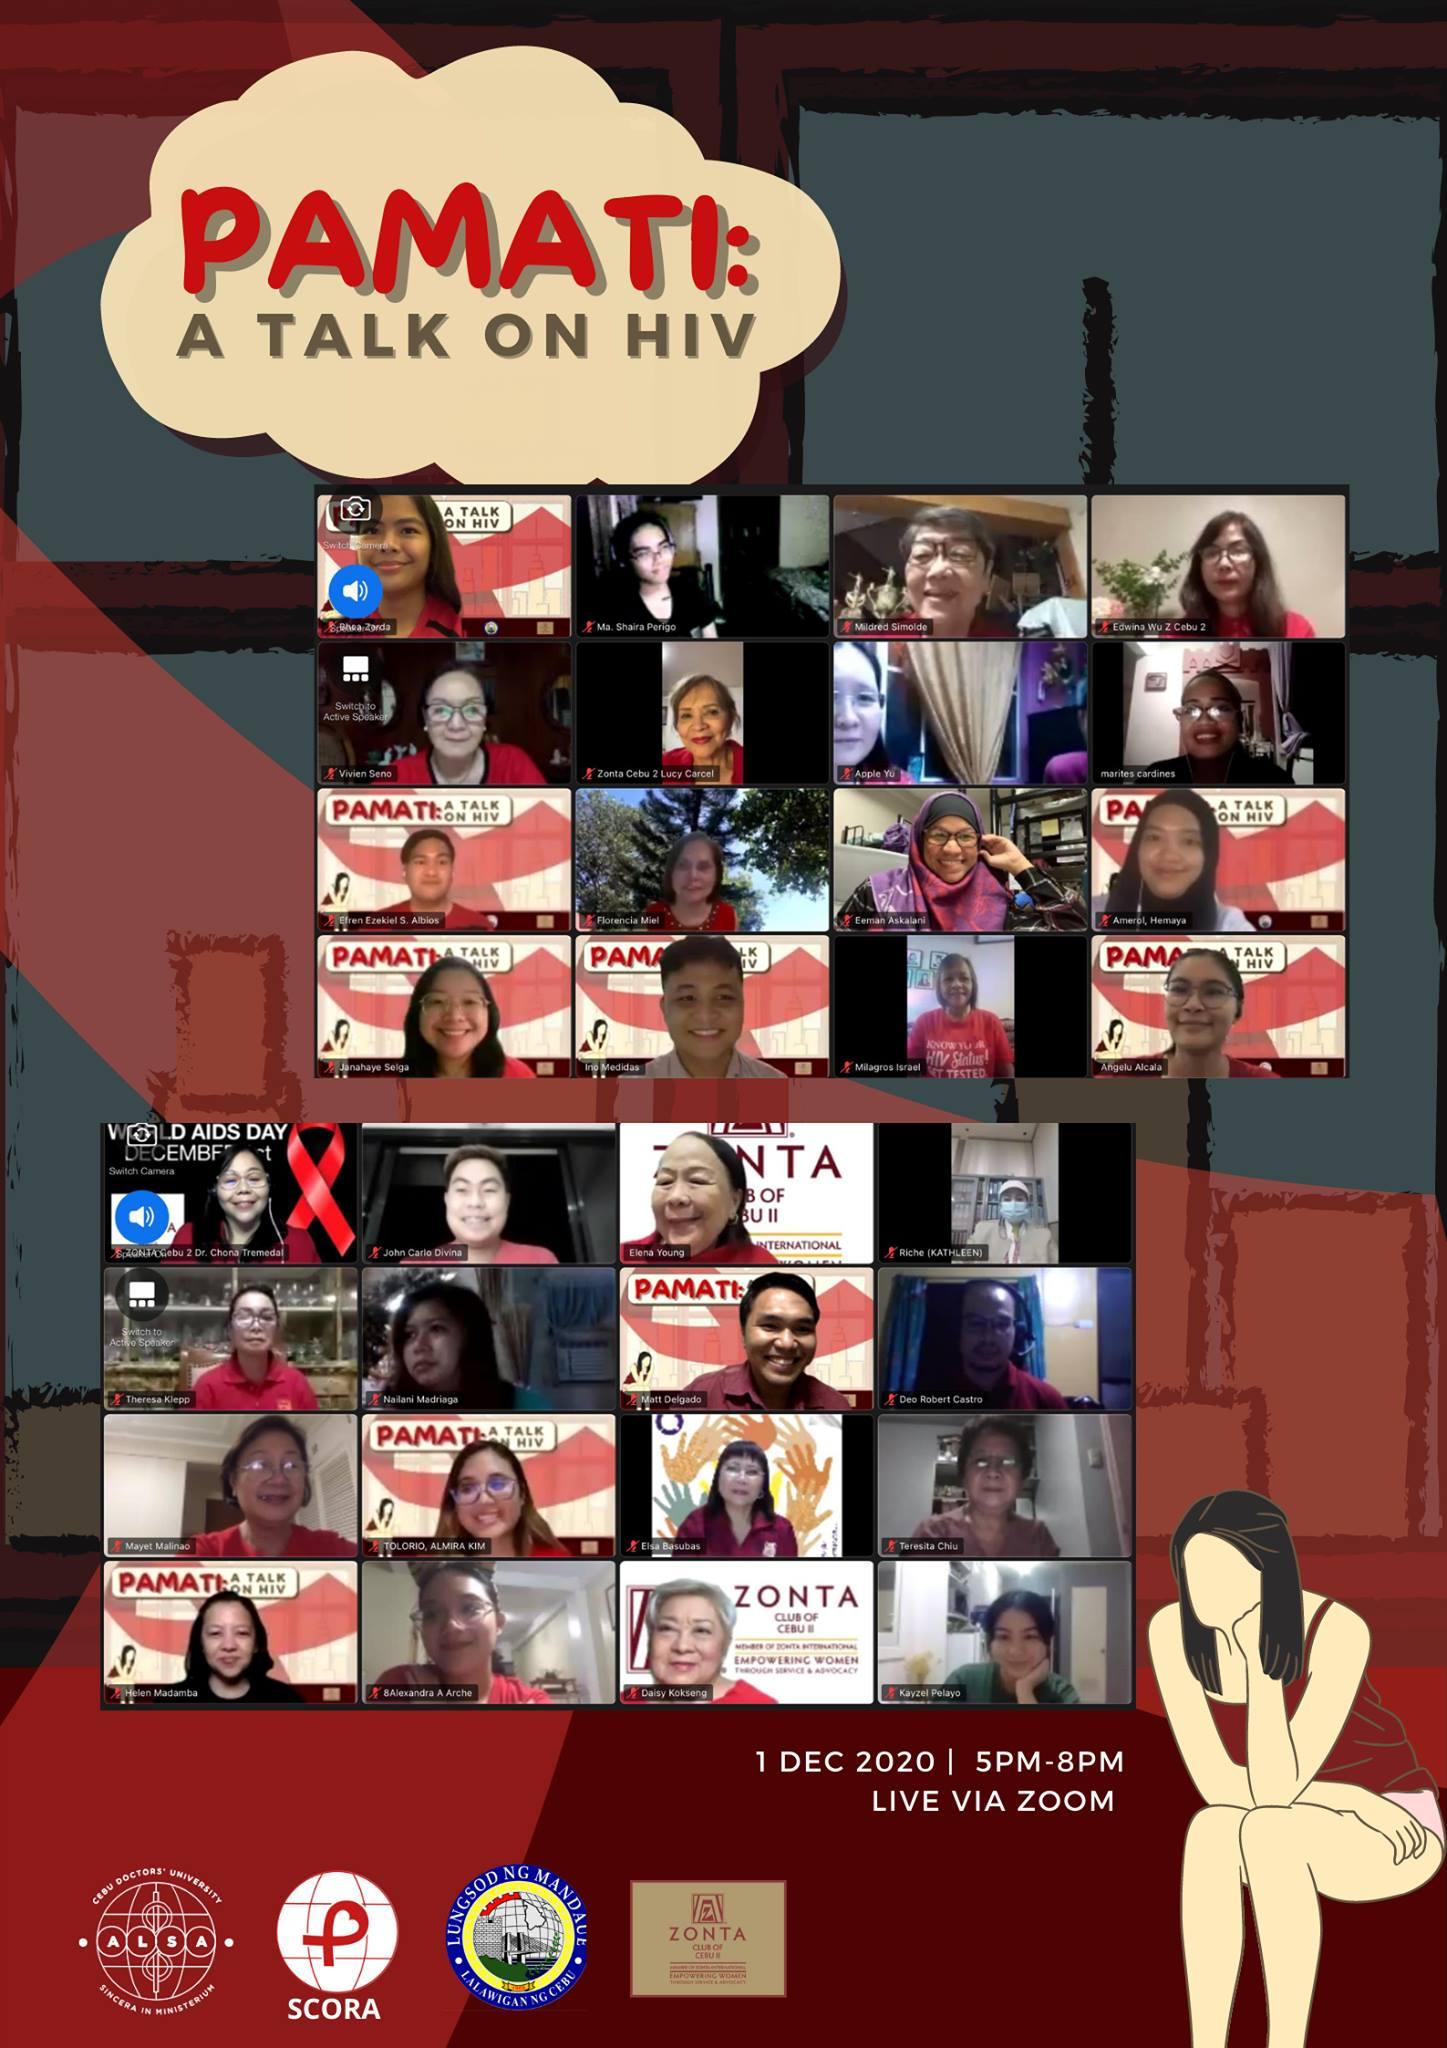 D:\2020 DESKTOP FILES\RMA NEWS\ARTICLES\ARTICLE 652 - ZONTA HIV\PR 16 - HIV\1.jpg